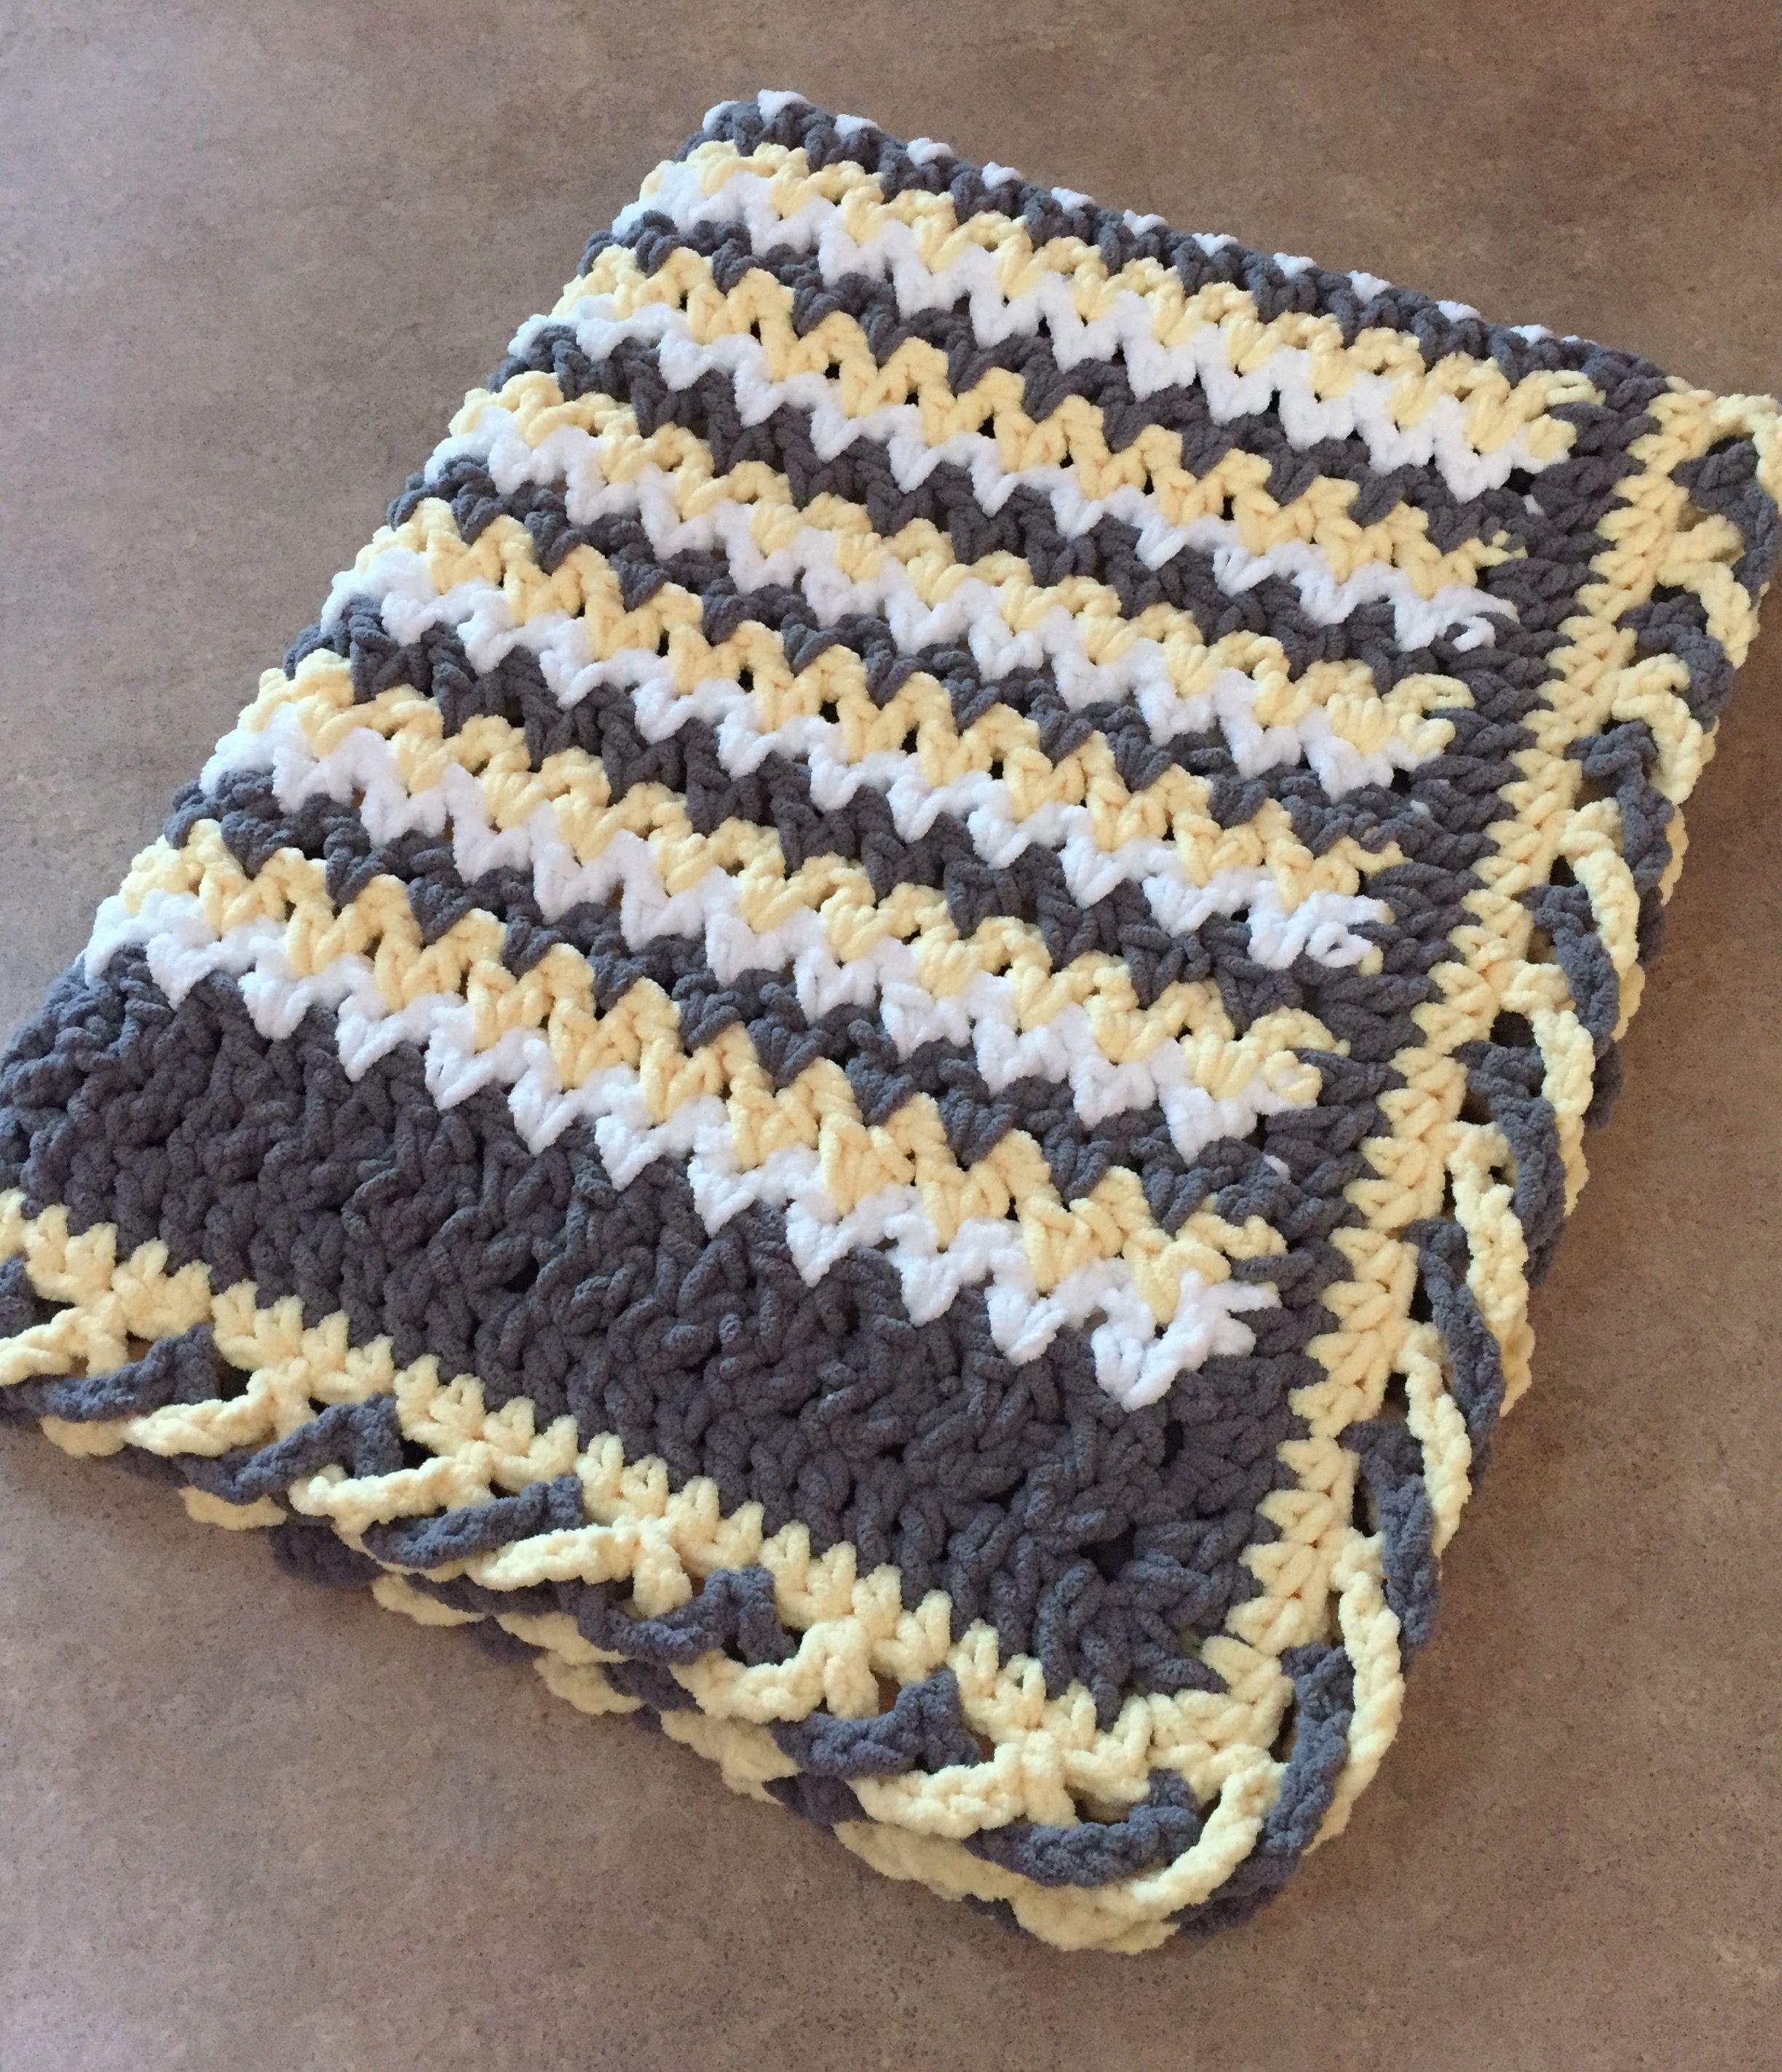 Crib Size Blanket Yellow/white/gray with crisscross edge. Super soft ...